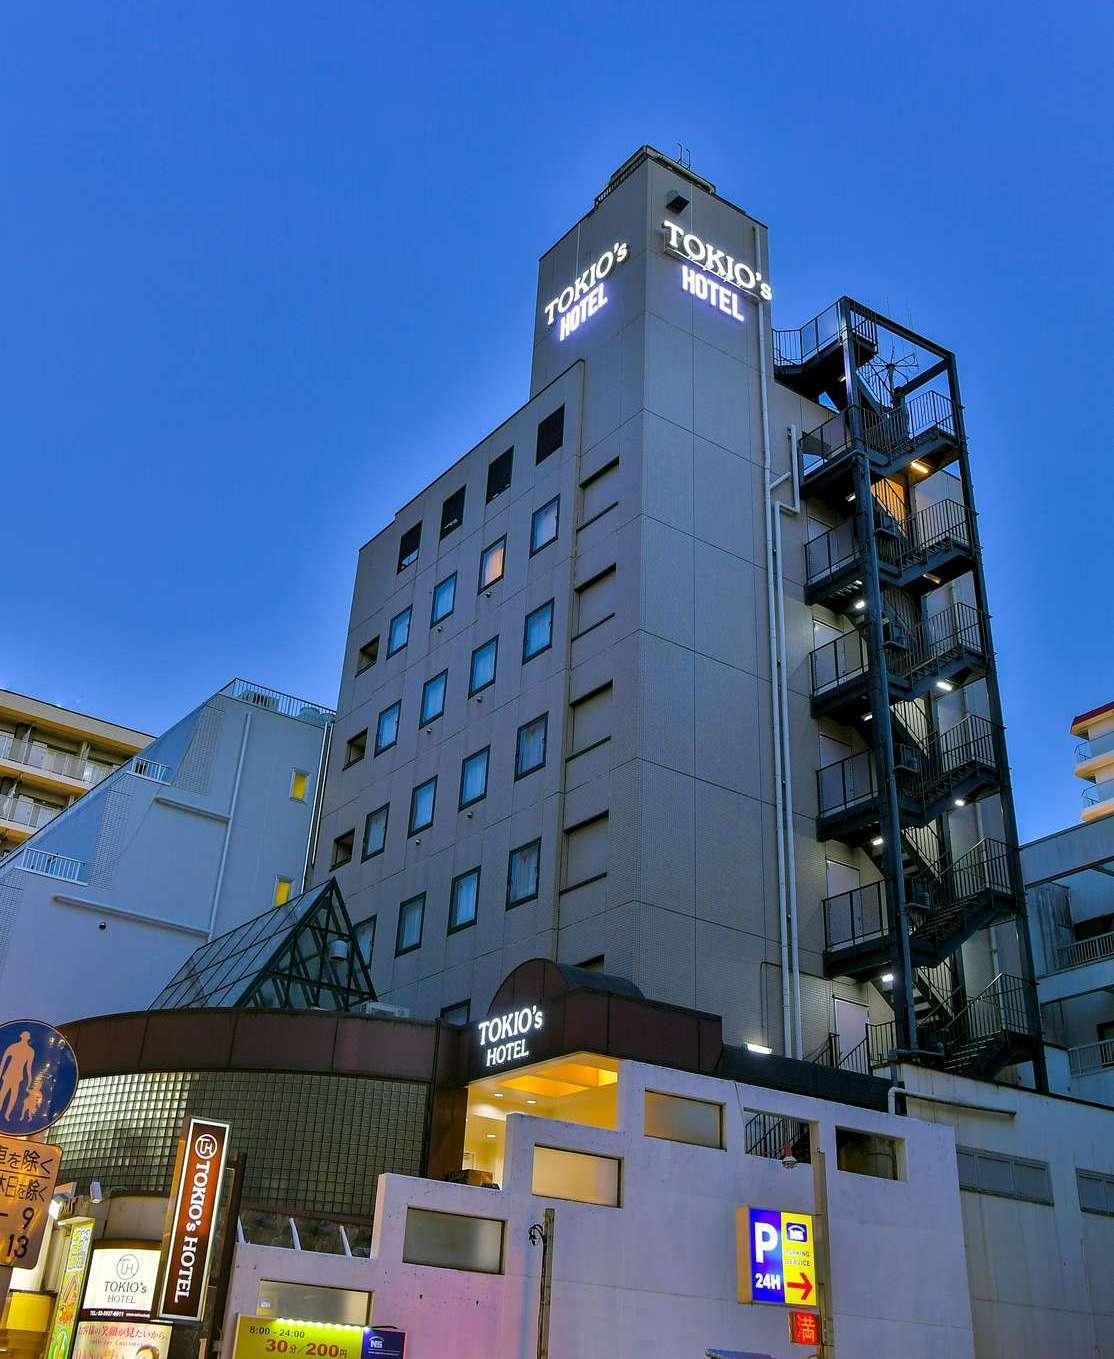 TOKIO's HOTEL(旧アークホテルナインティース)の詳細